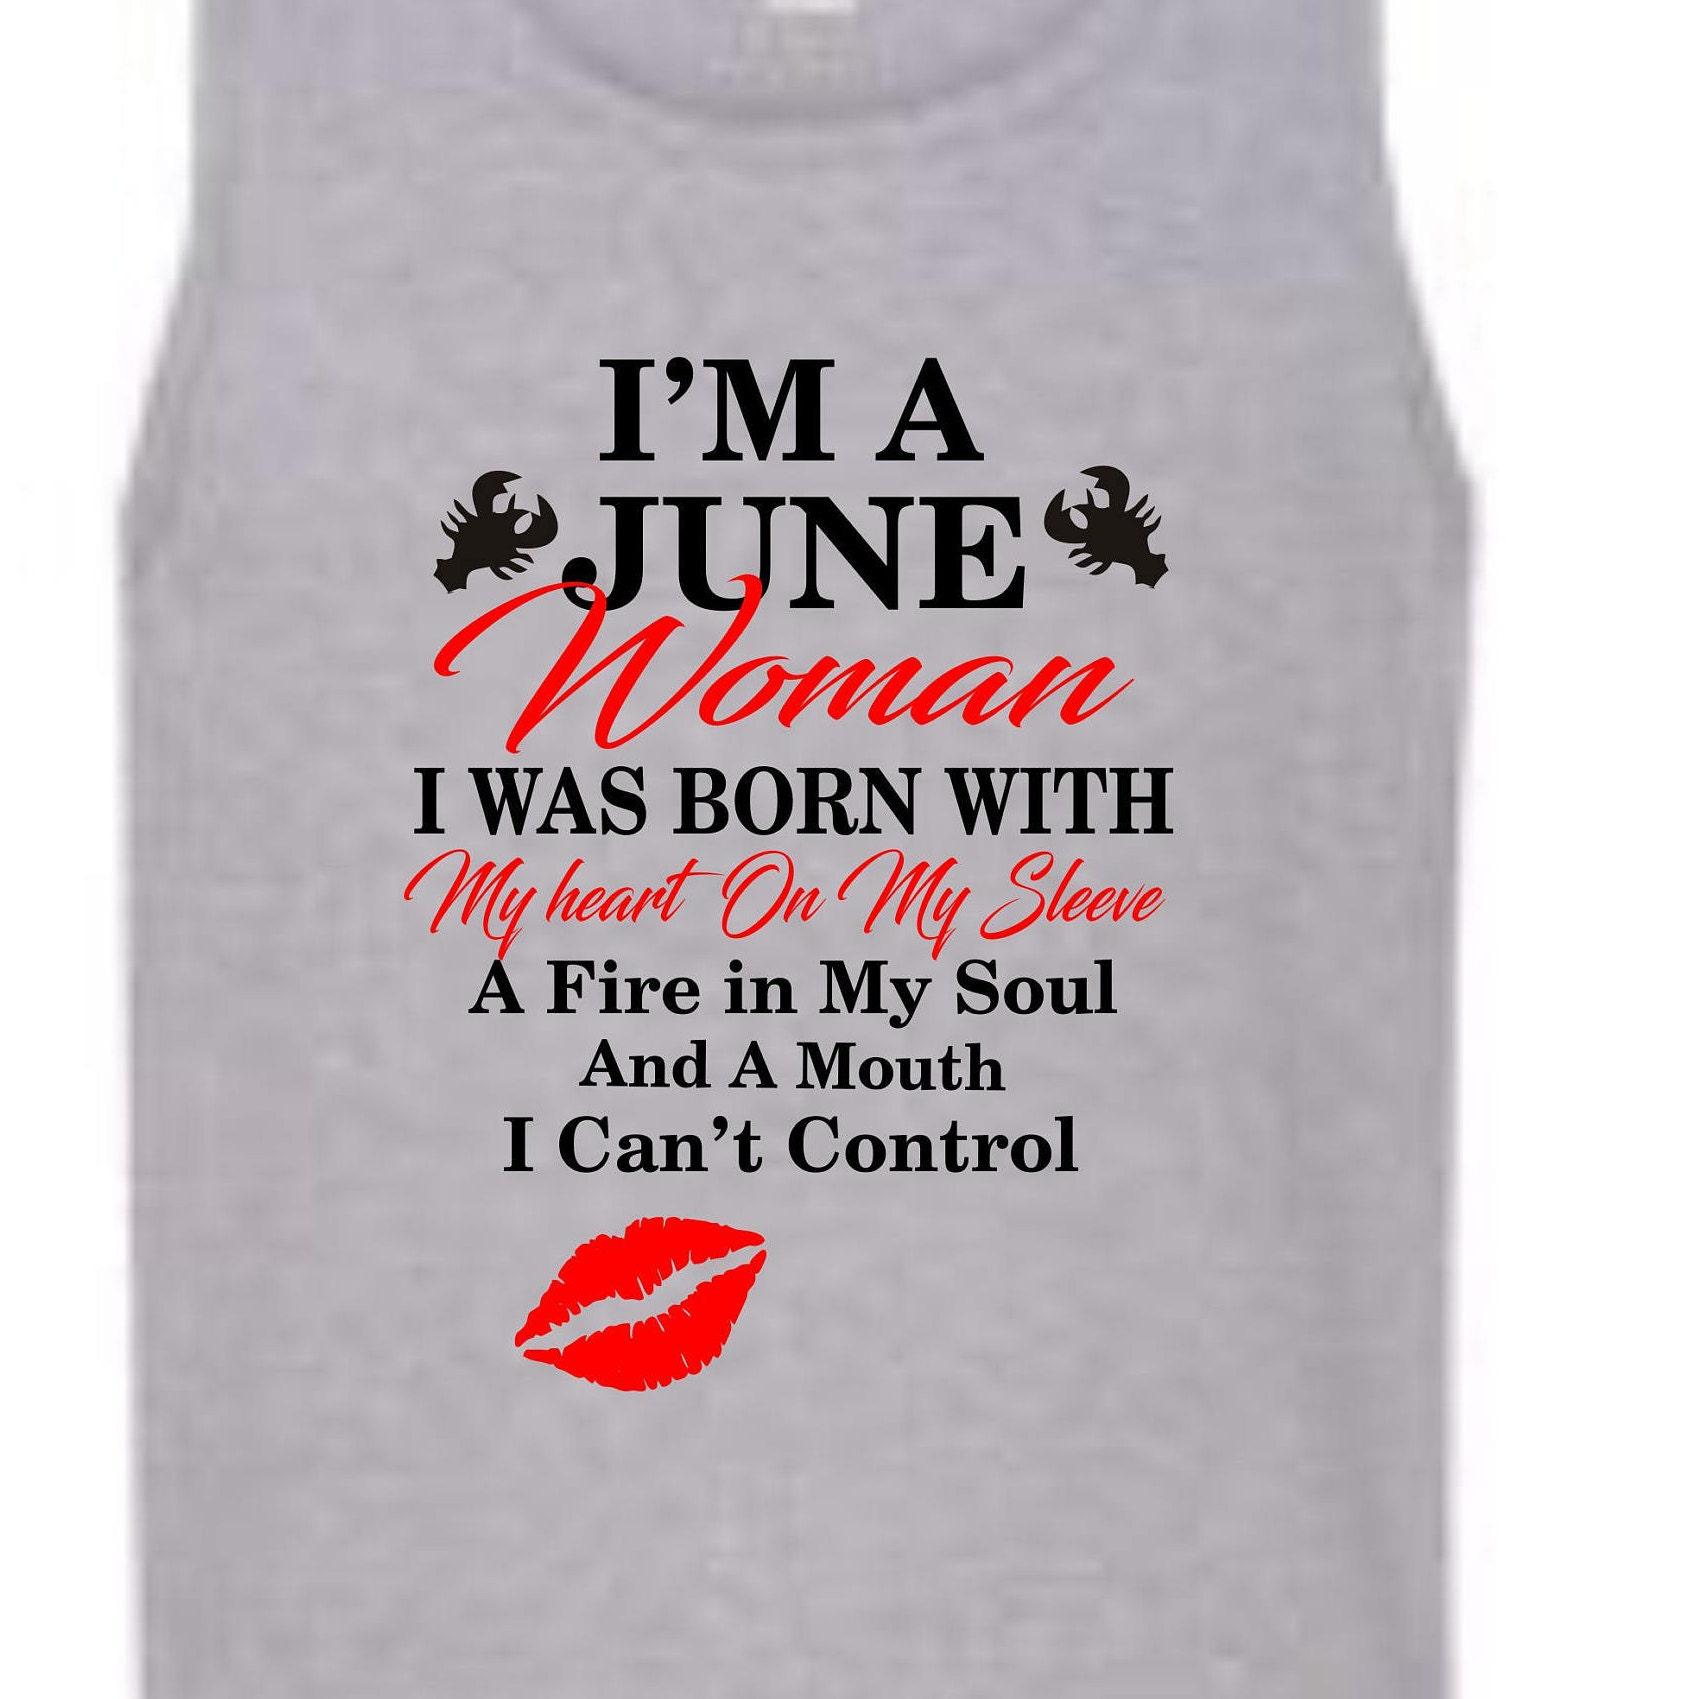 abbc3032b1f I m a June Woman shirt